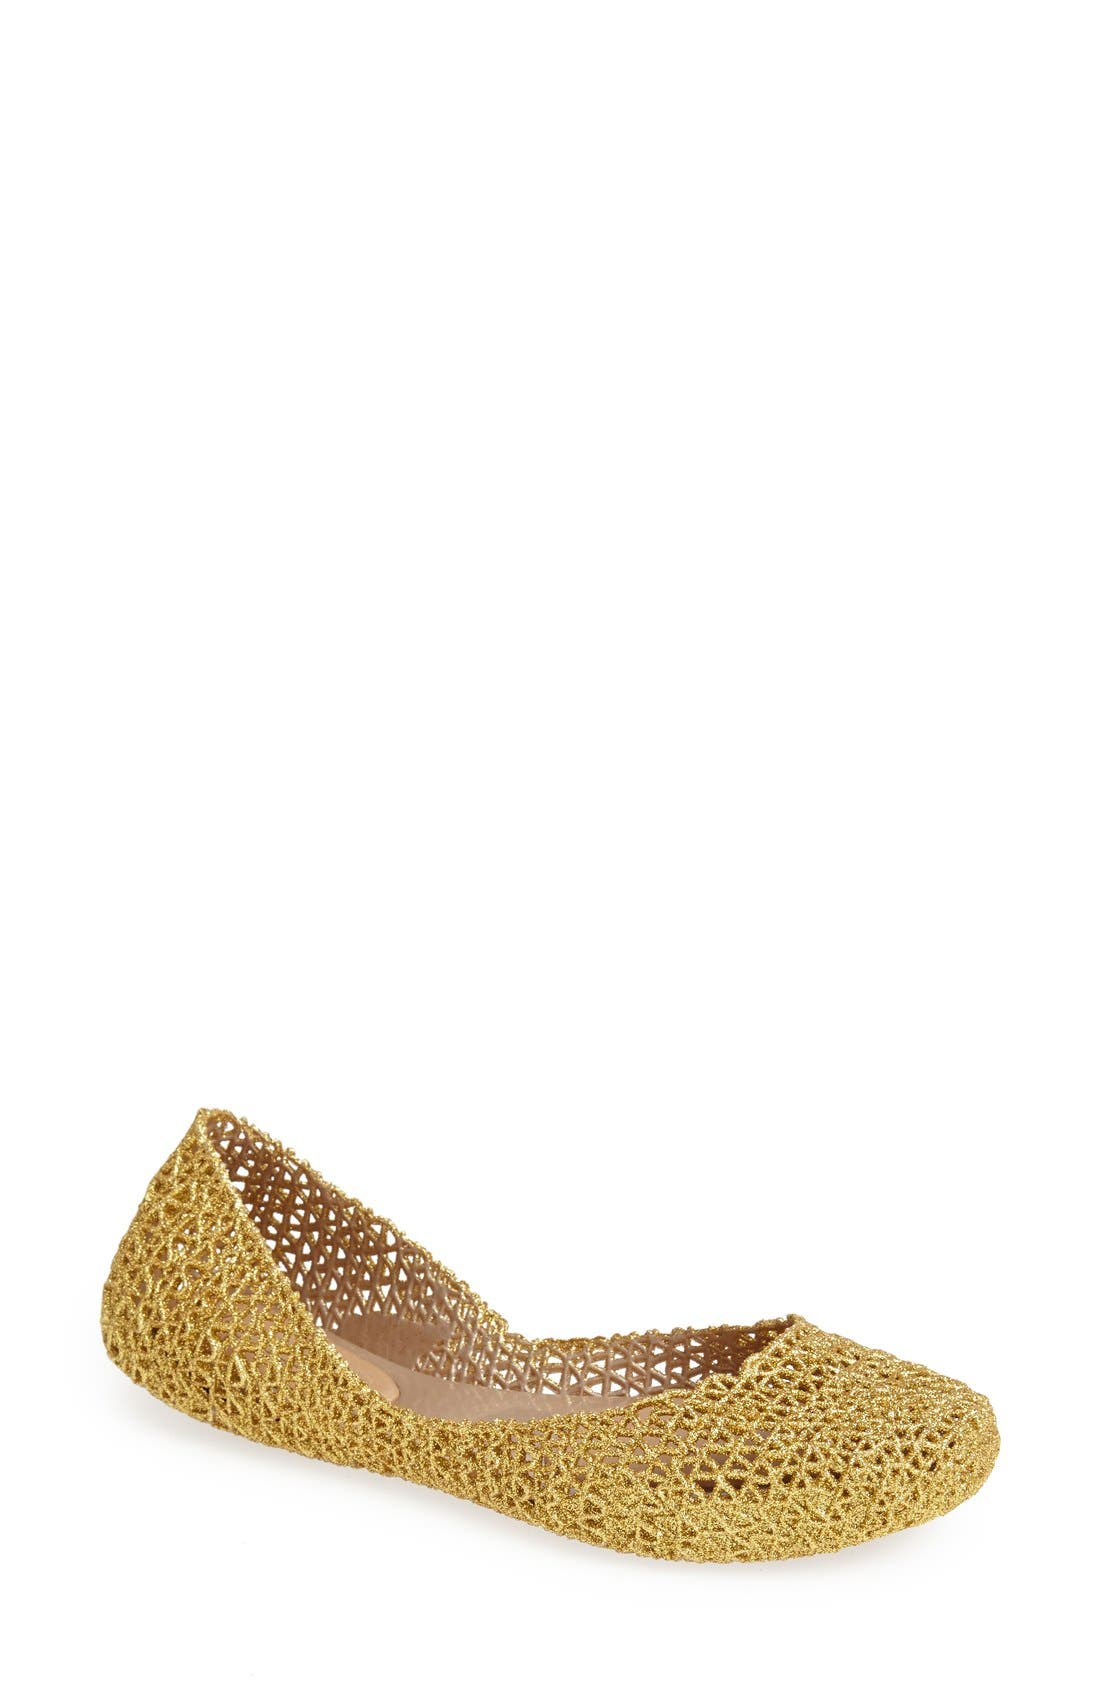 'Campana Papel Vii' Jelly Flat in Gold Glitter